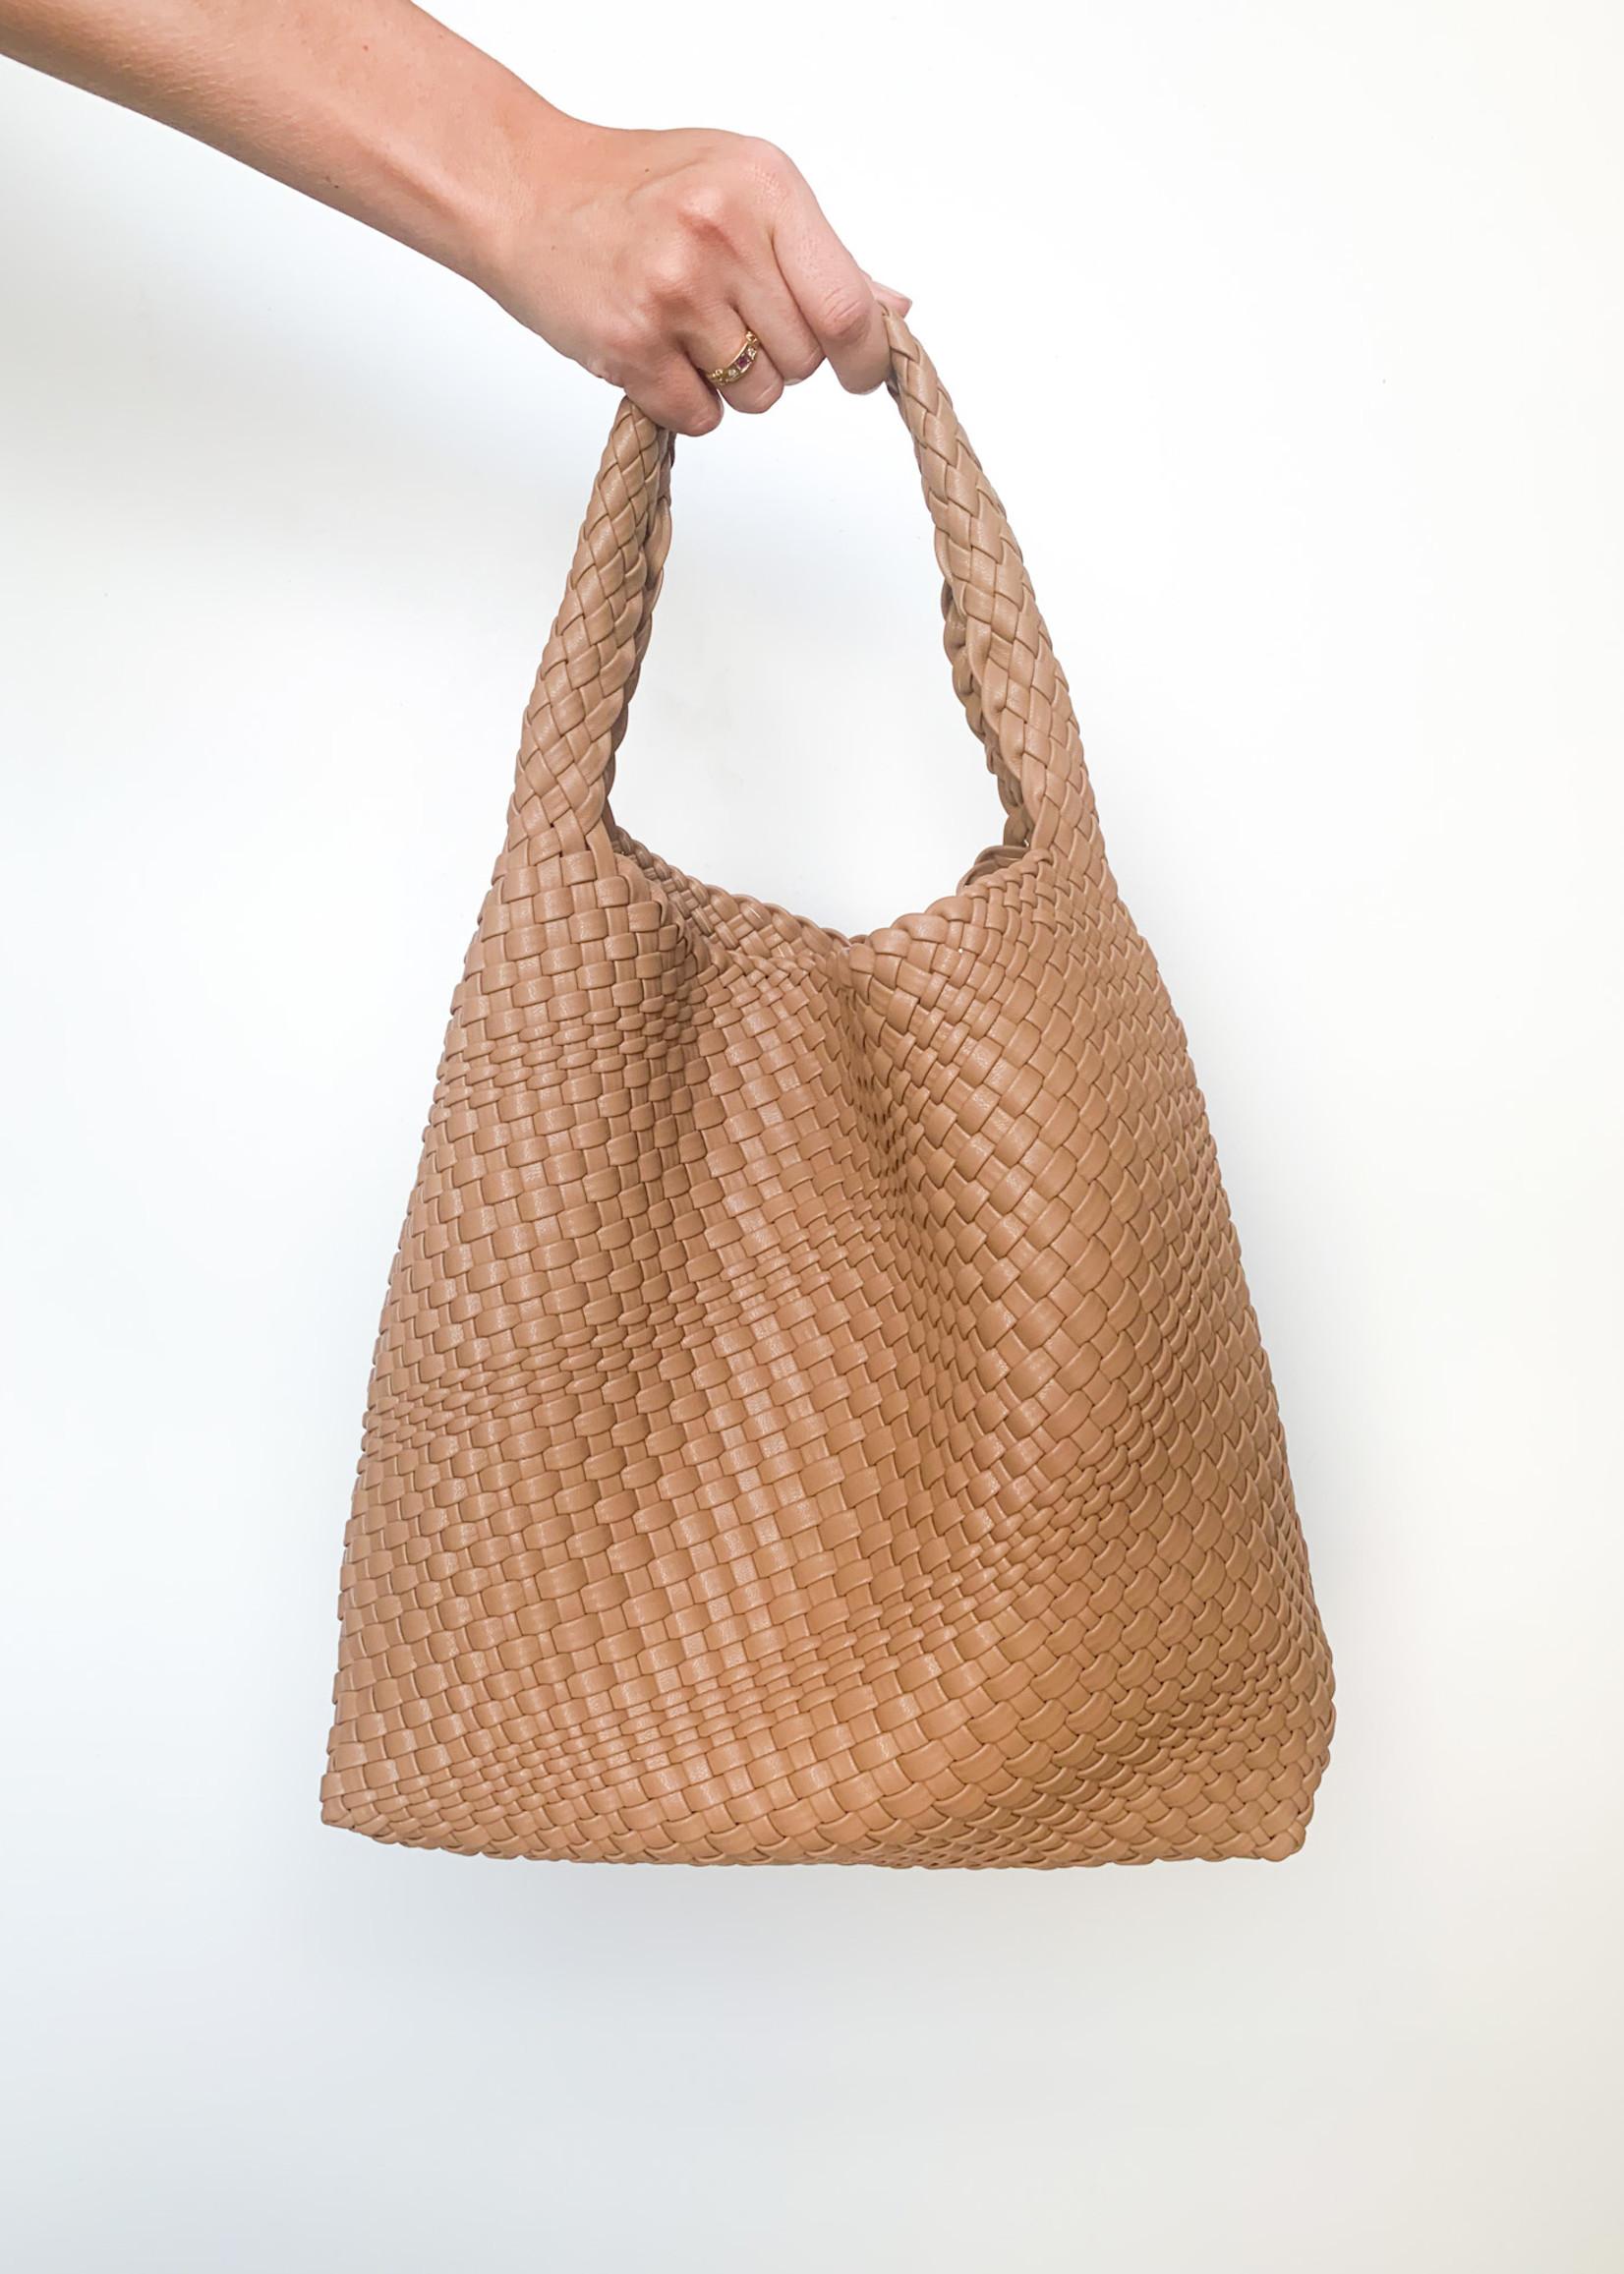 hula sue woven sling bag - tan